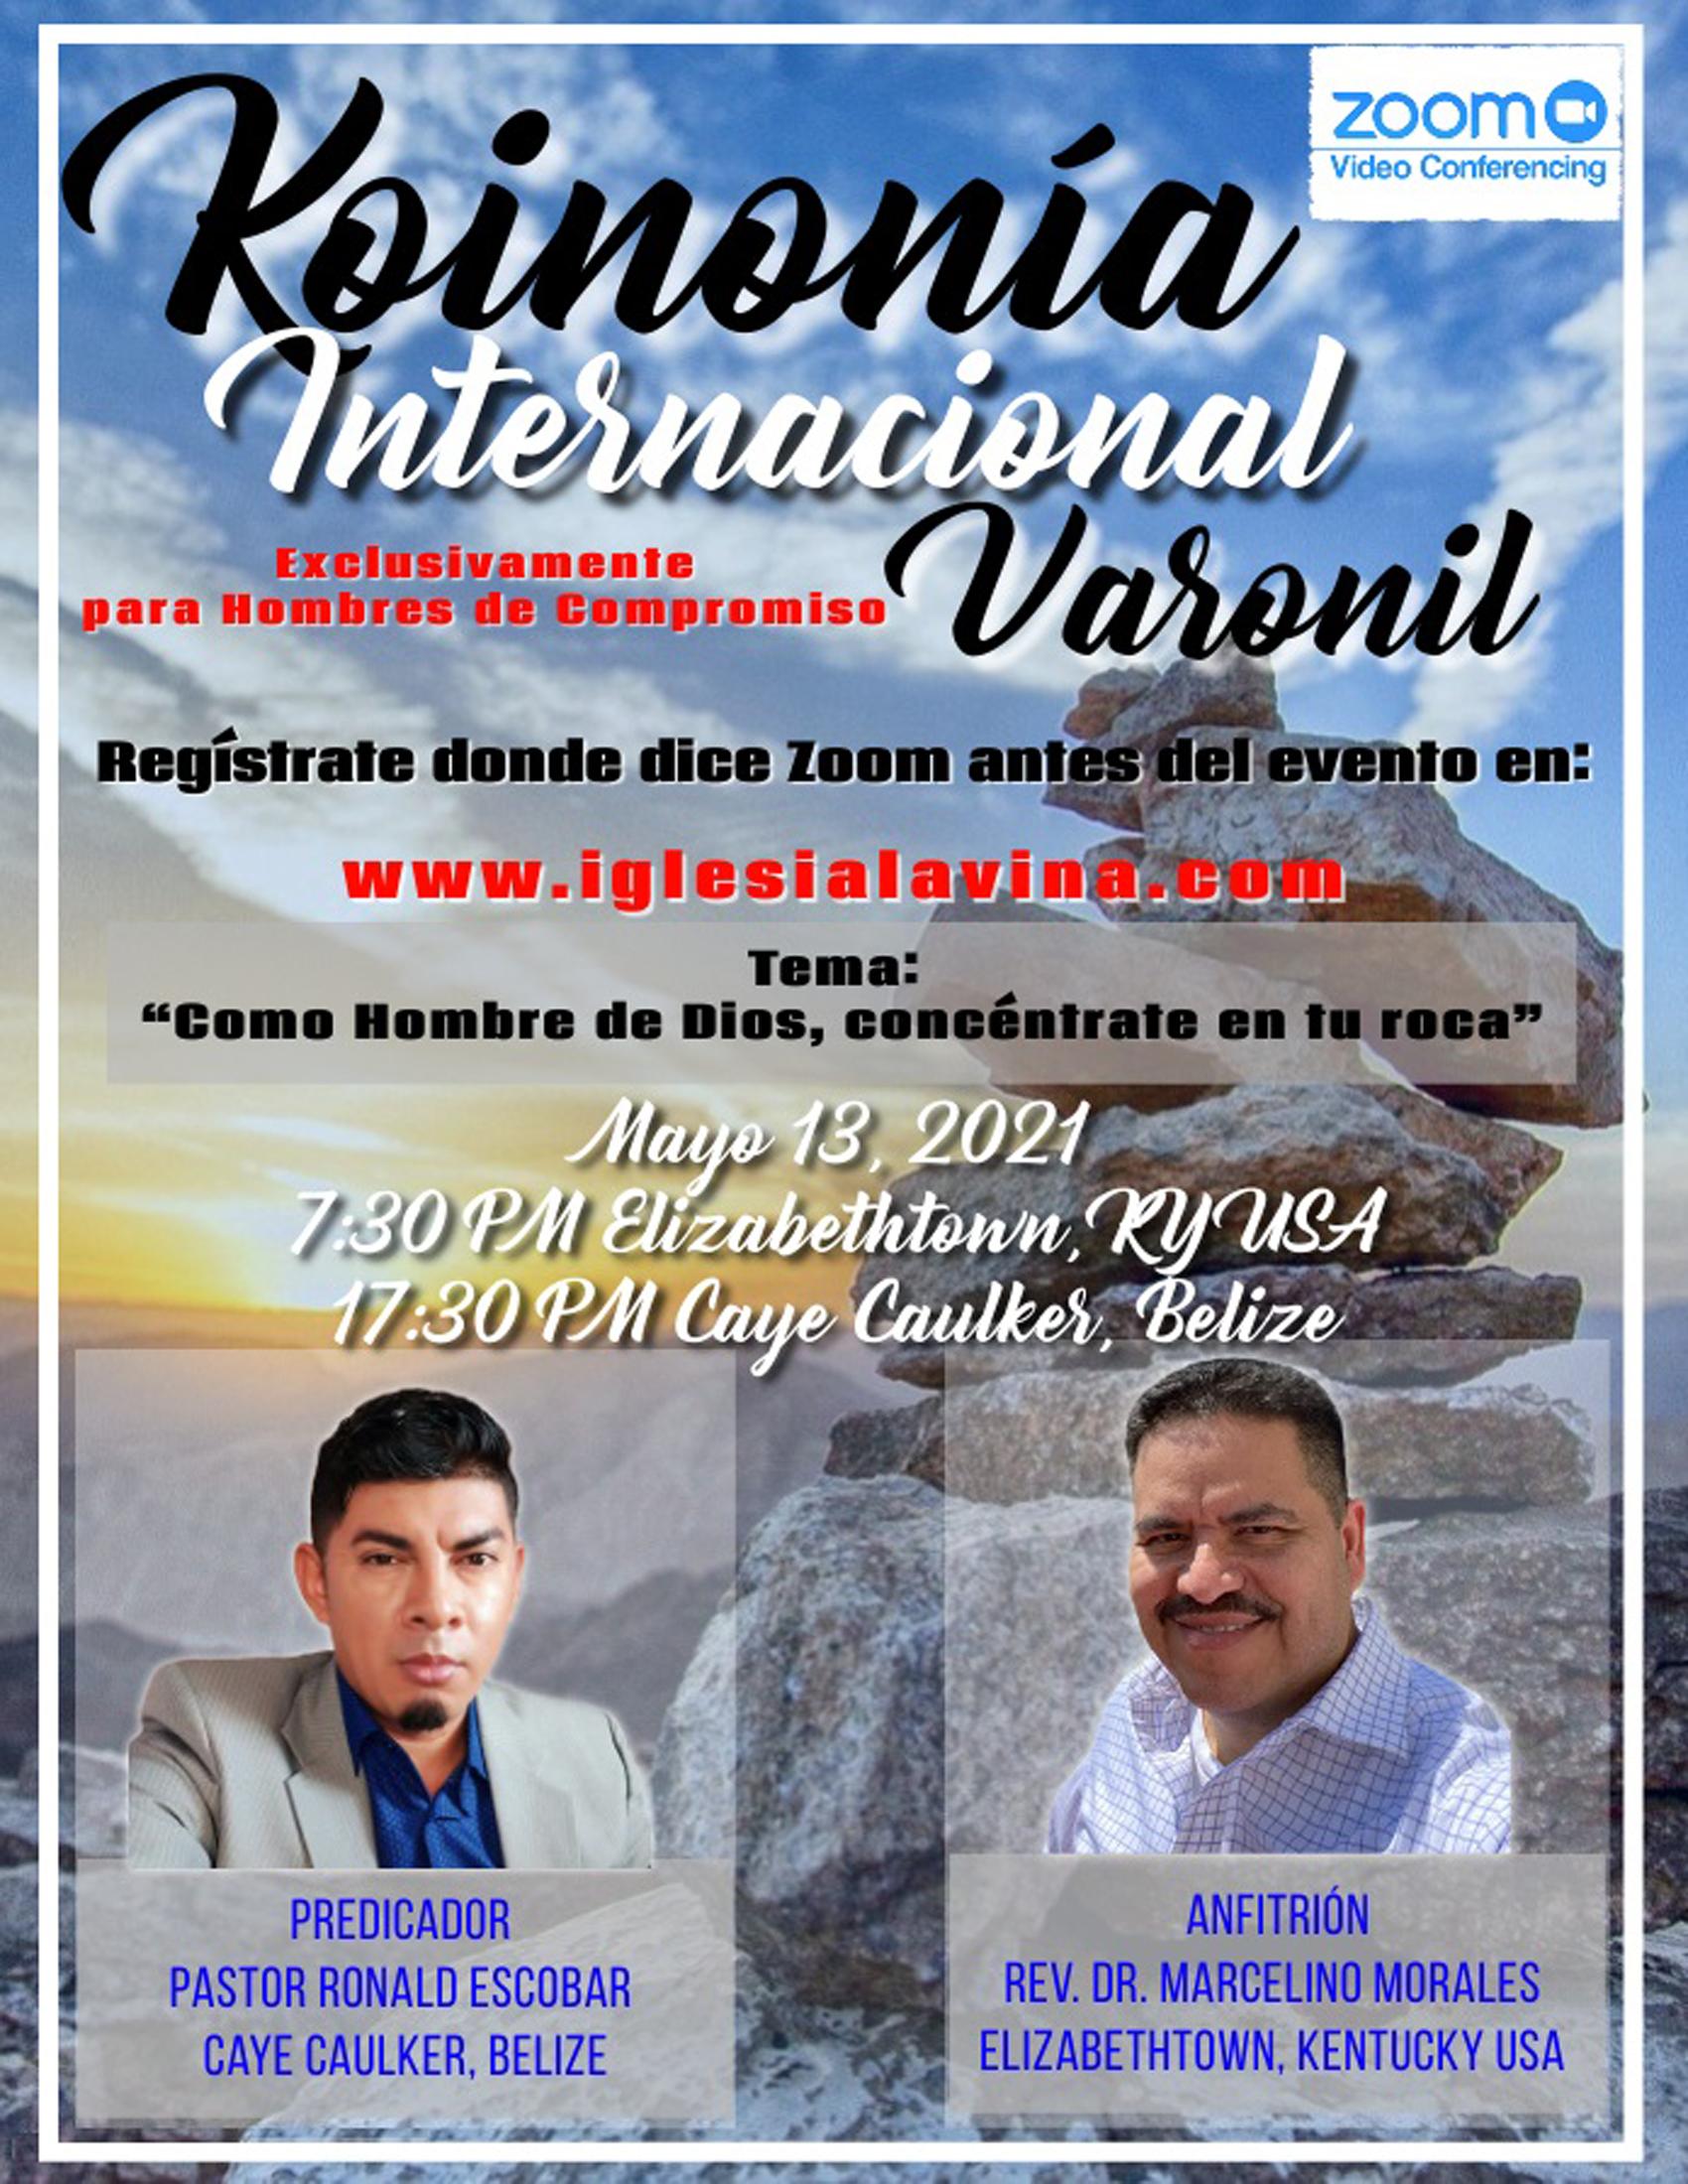 Koinonía 5-13-2021 - Pastor Ronald Escob